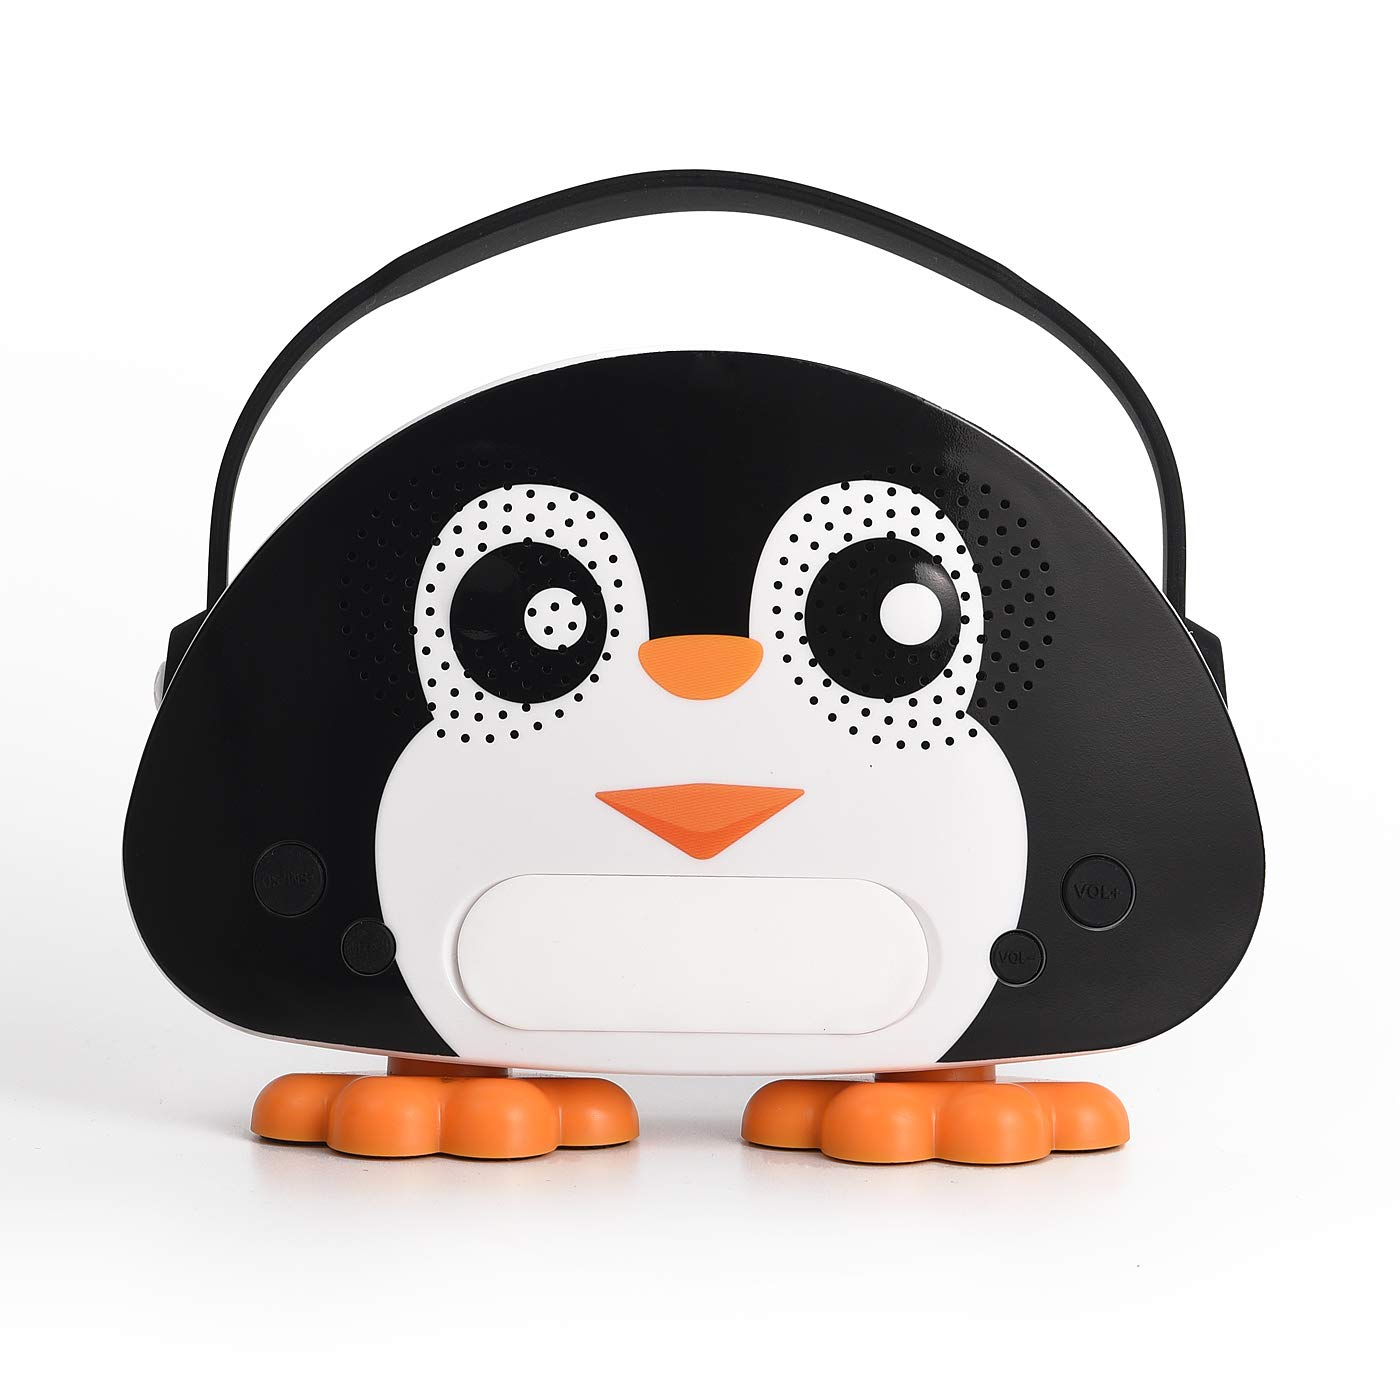 HowQ Outdoor Toys Karaoke Machine , Portable Kids Karaoke Bluetooth Speaker Wireless Cartoon Speaker for Kids for Indoor Toys Travel Activities with Microphone Penguin Karaoke Machine(Black-White) by HowQ (Image #2)